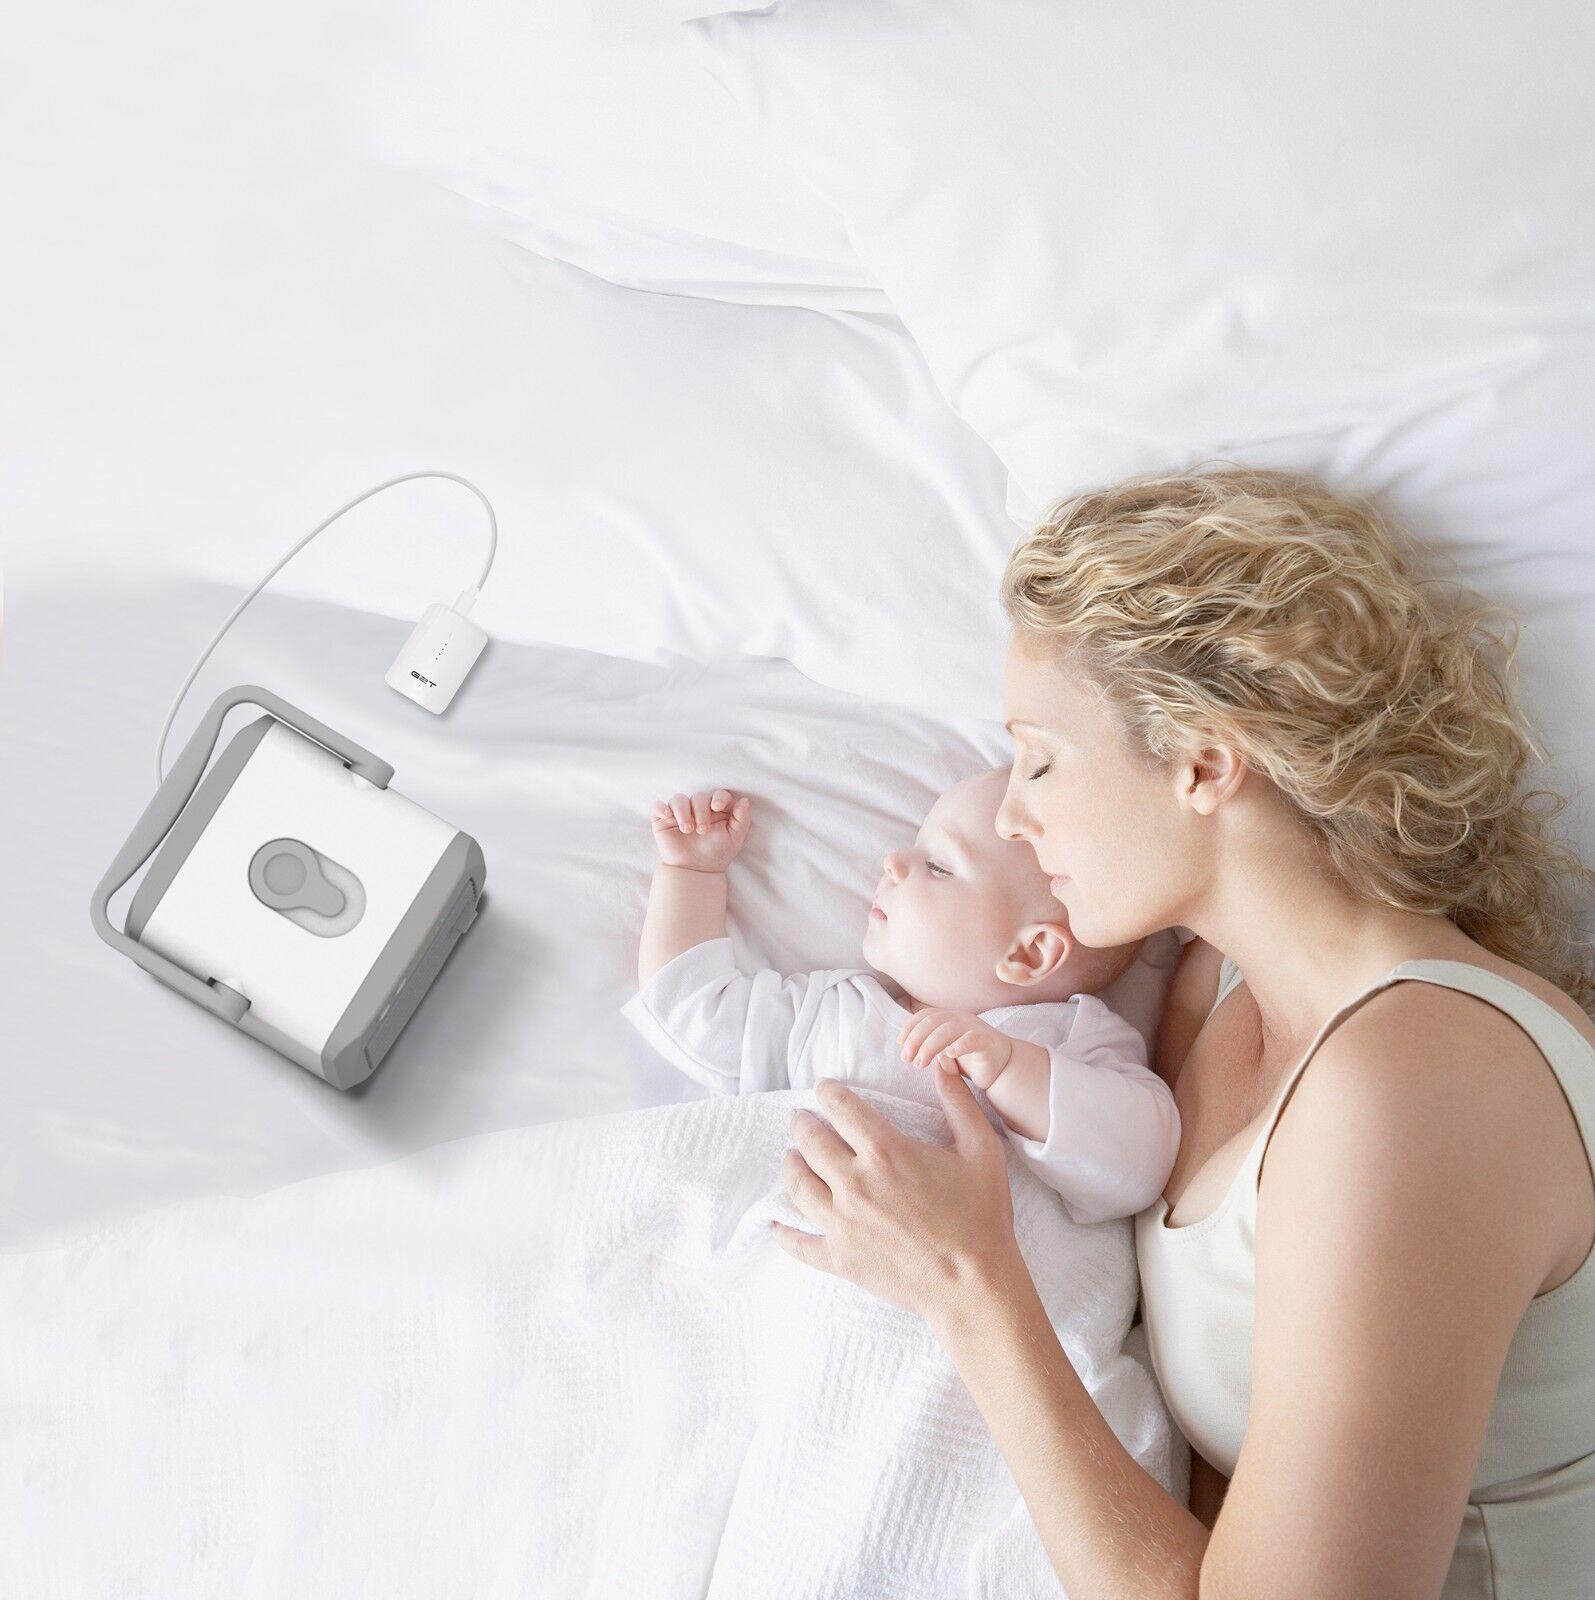 Portable Evaporative Cooling Mini Aircooler Desktop Conditioner Purifier G2t Ice